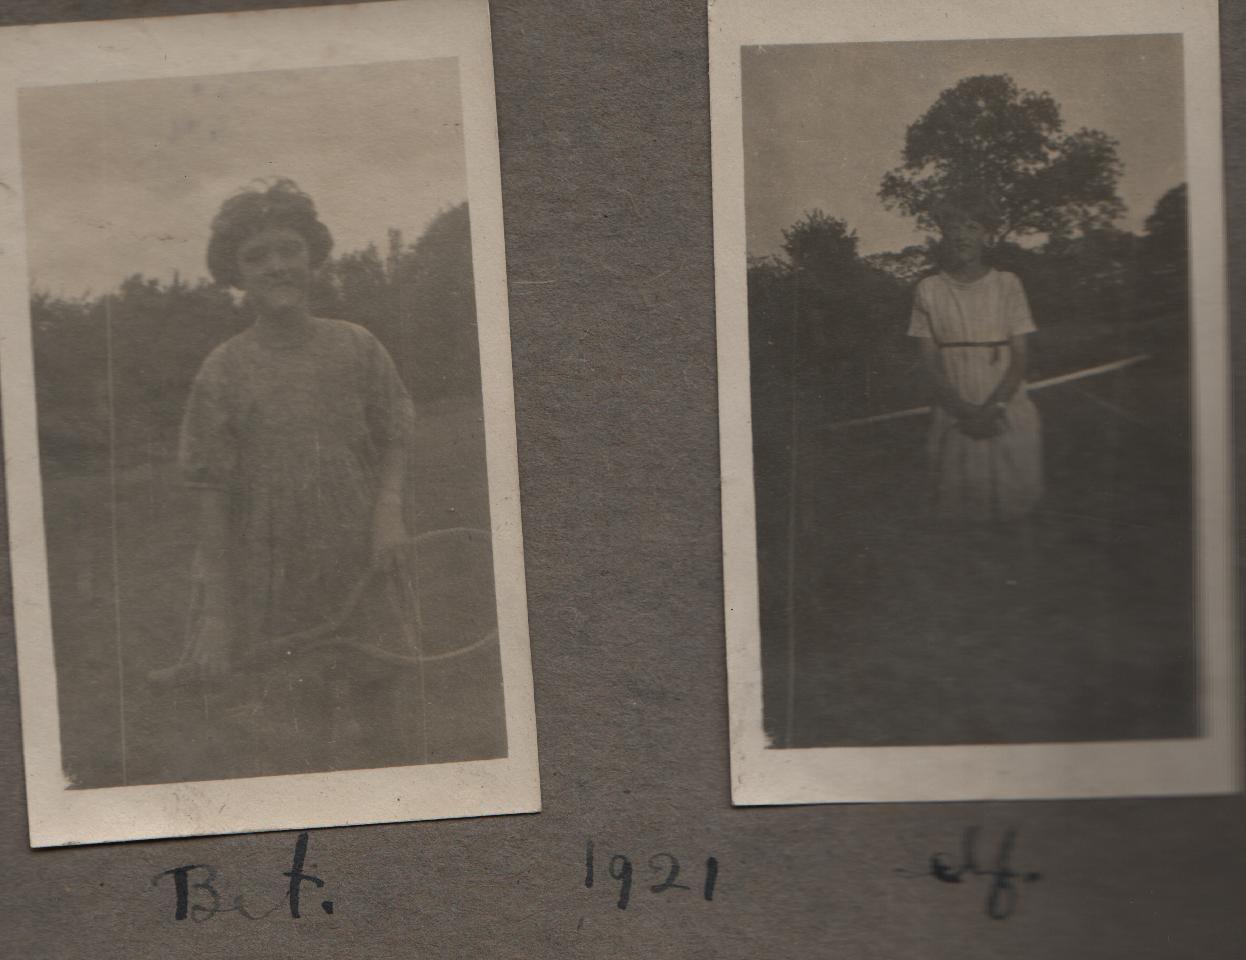 1921: Bet, self